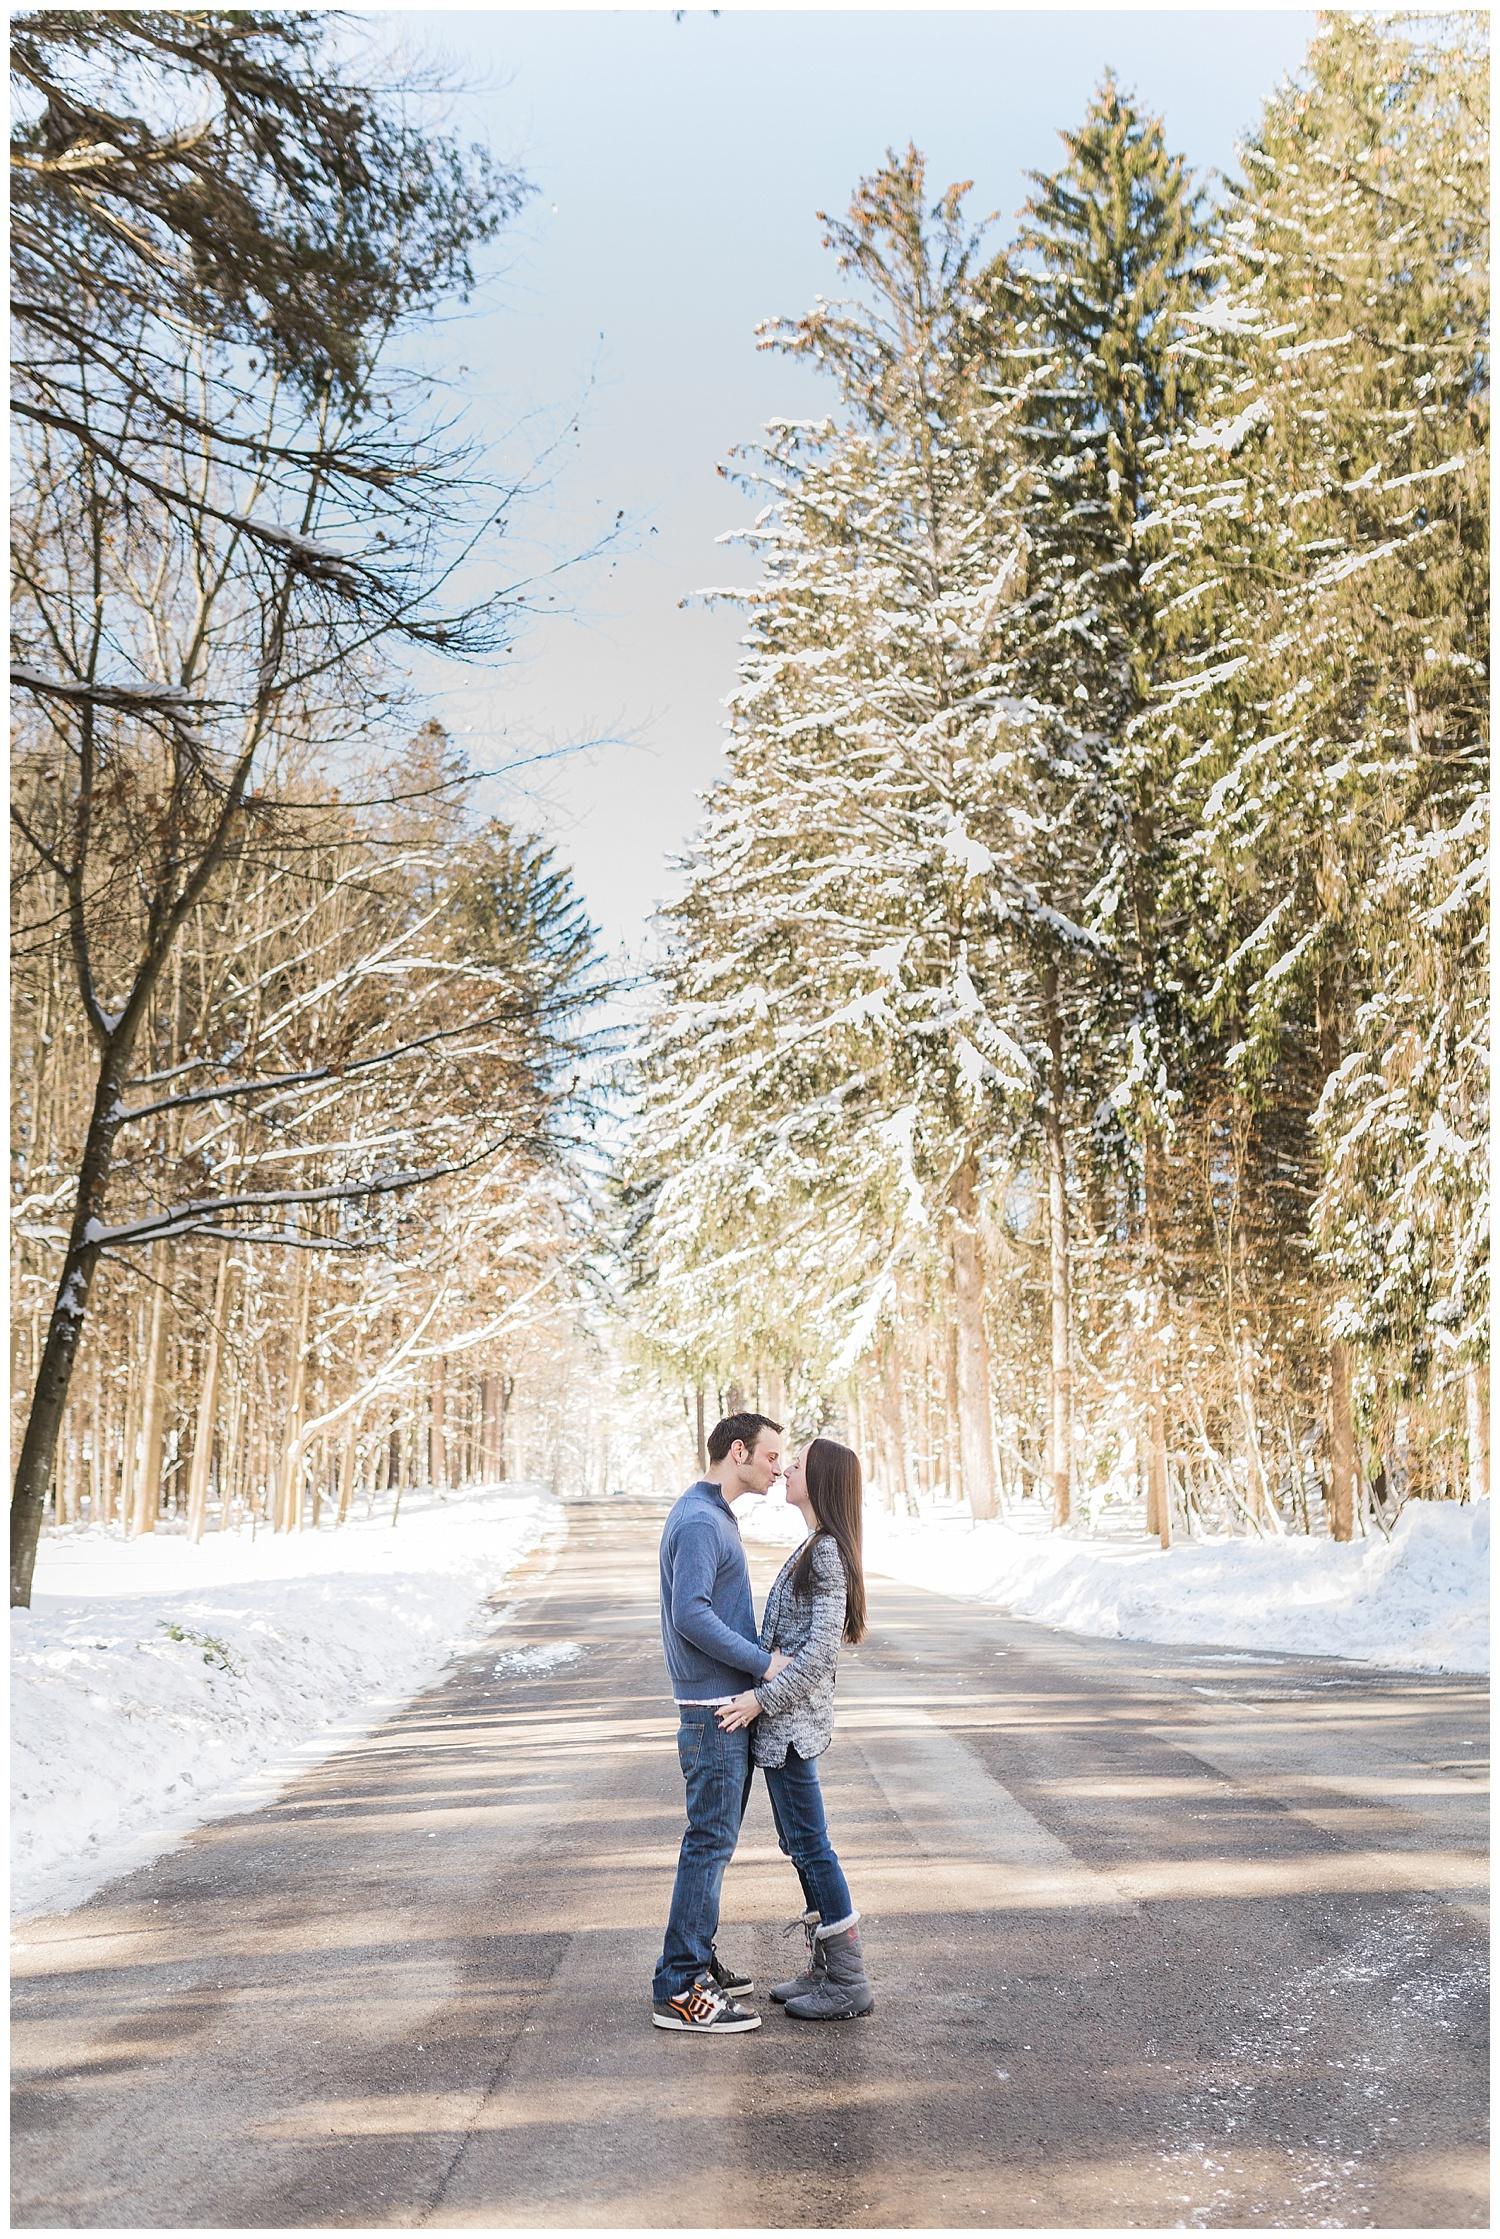 Matt and Jessica - Winter in Letchworth -2_Buffalo wedding photography.jpg